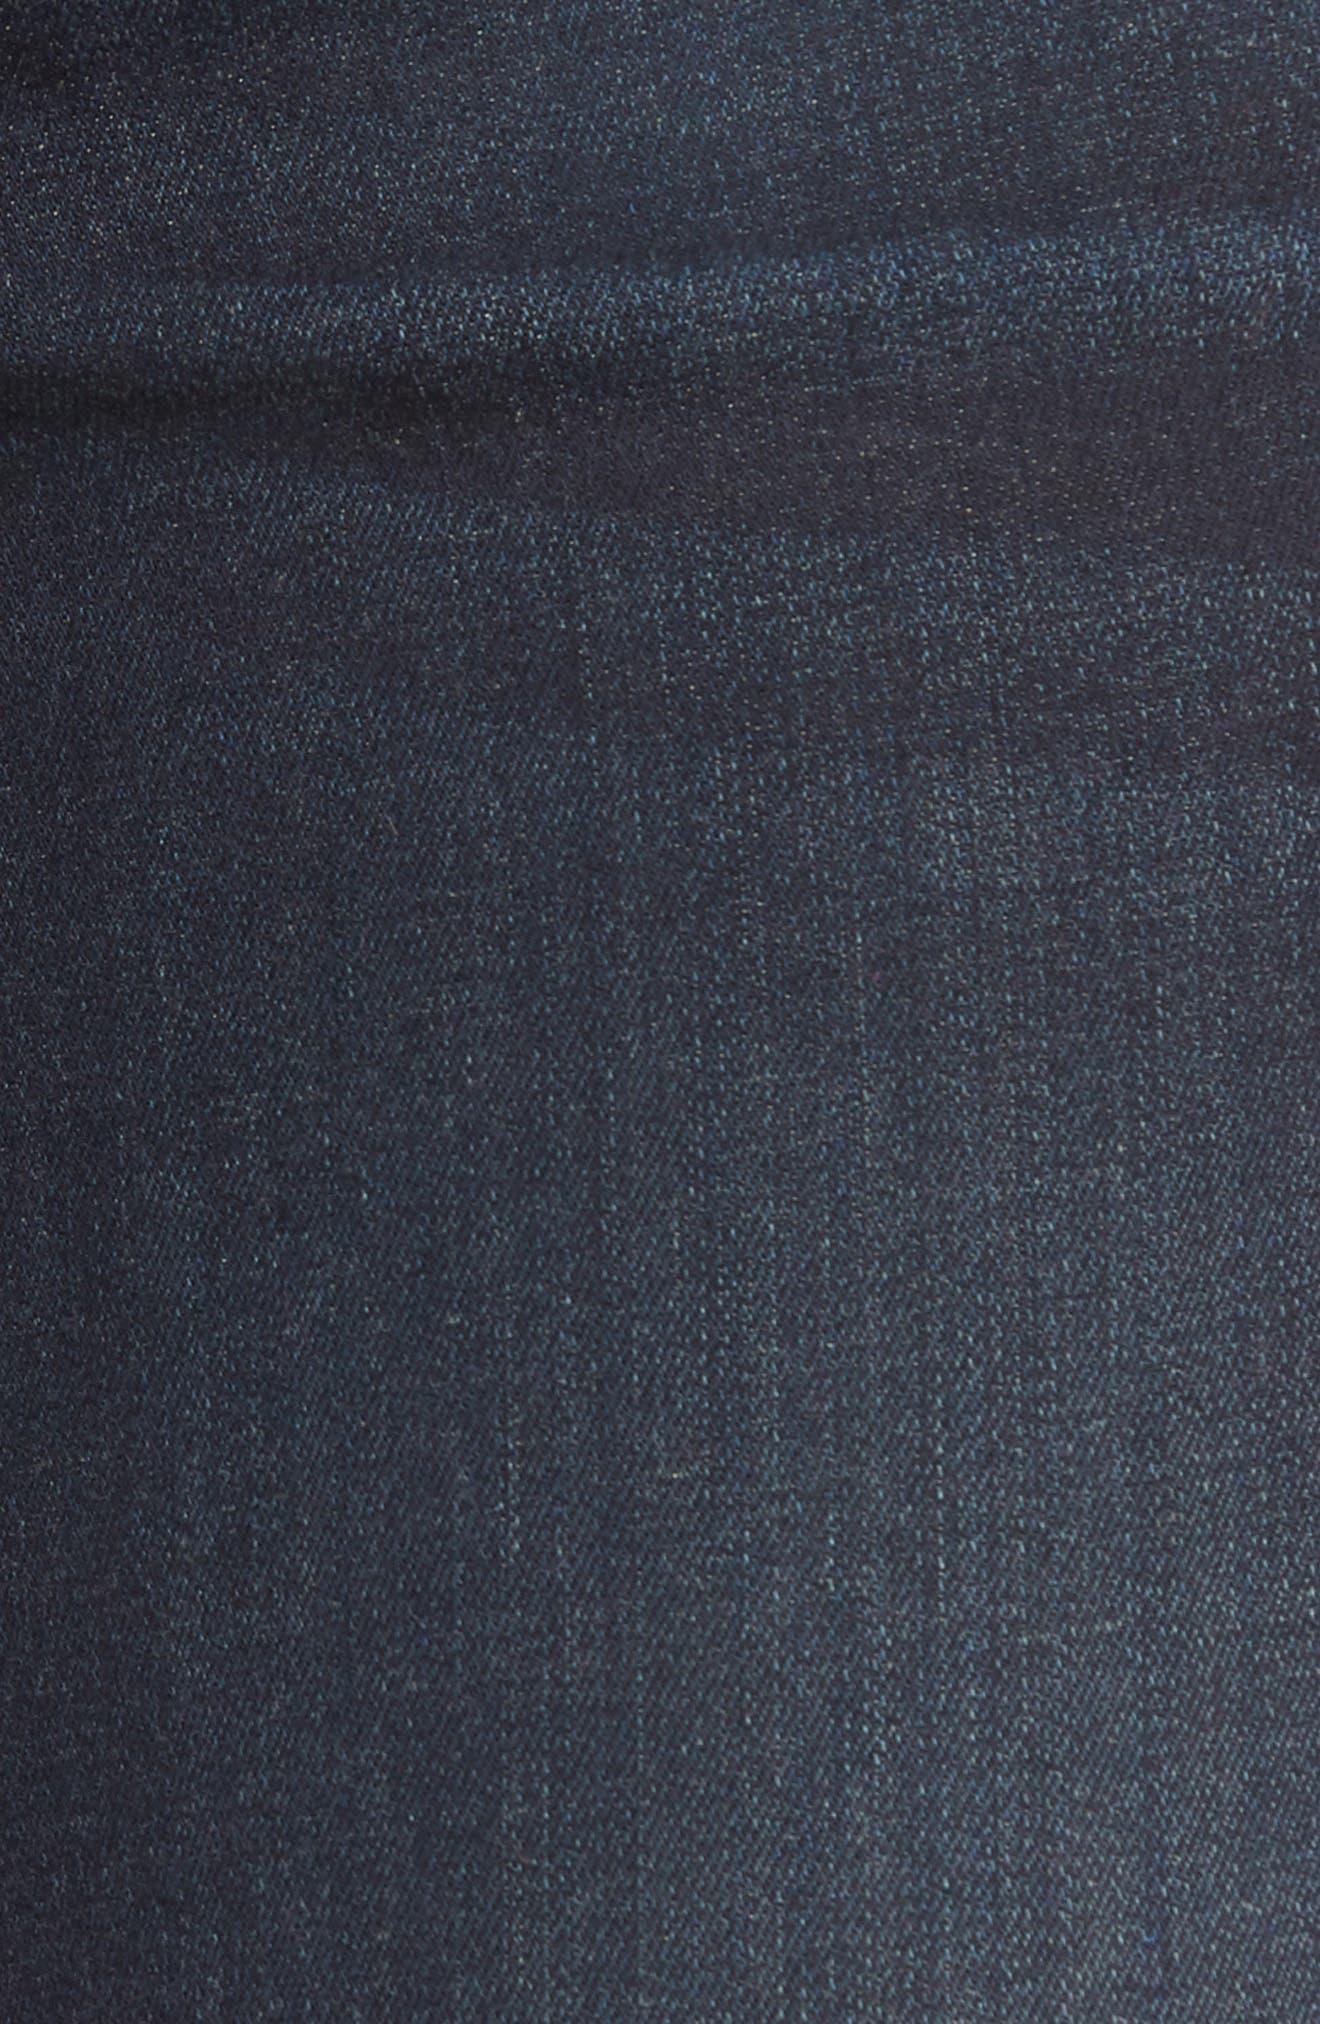 Diana Skinny Jeans,                             Alternate thumbnail 6, color,                             435